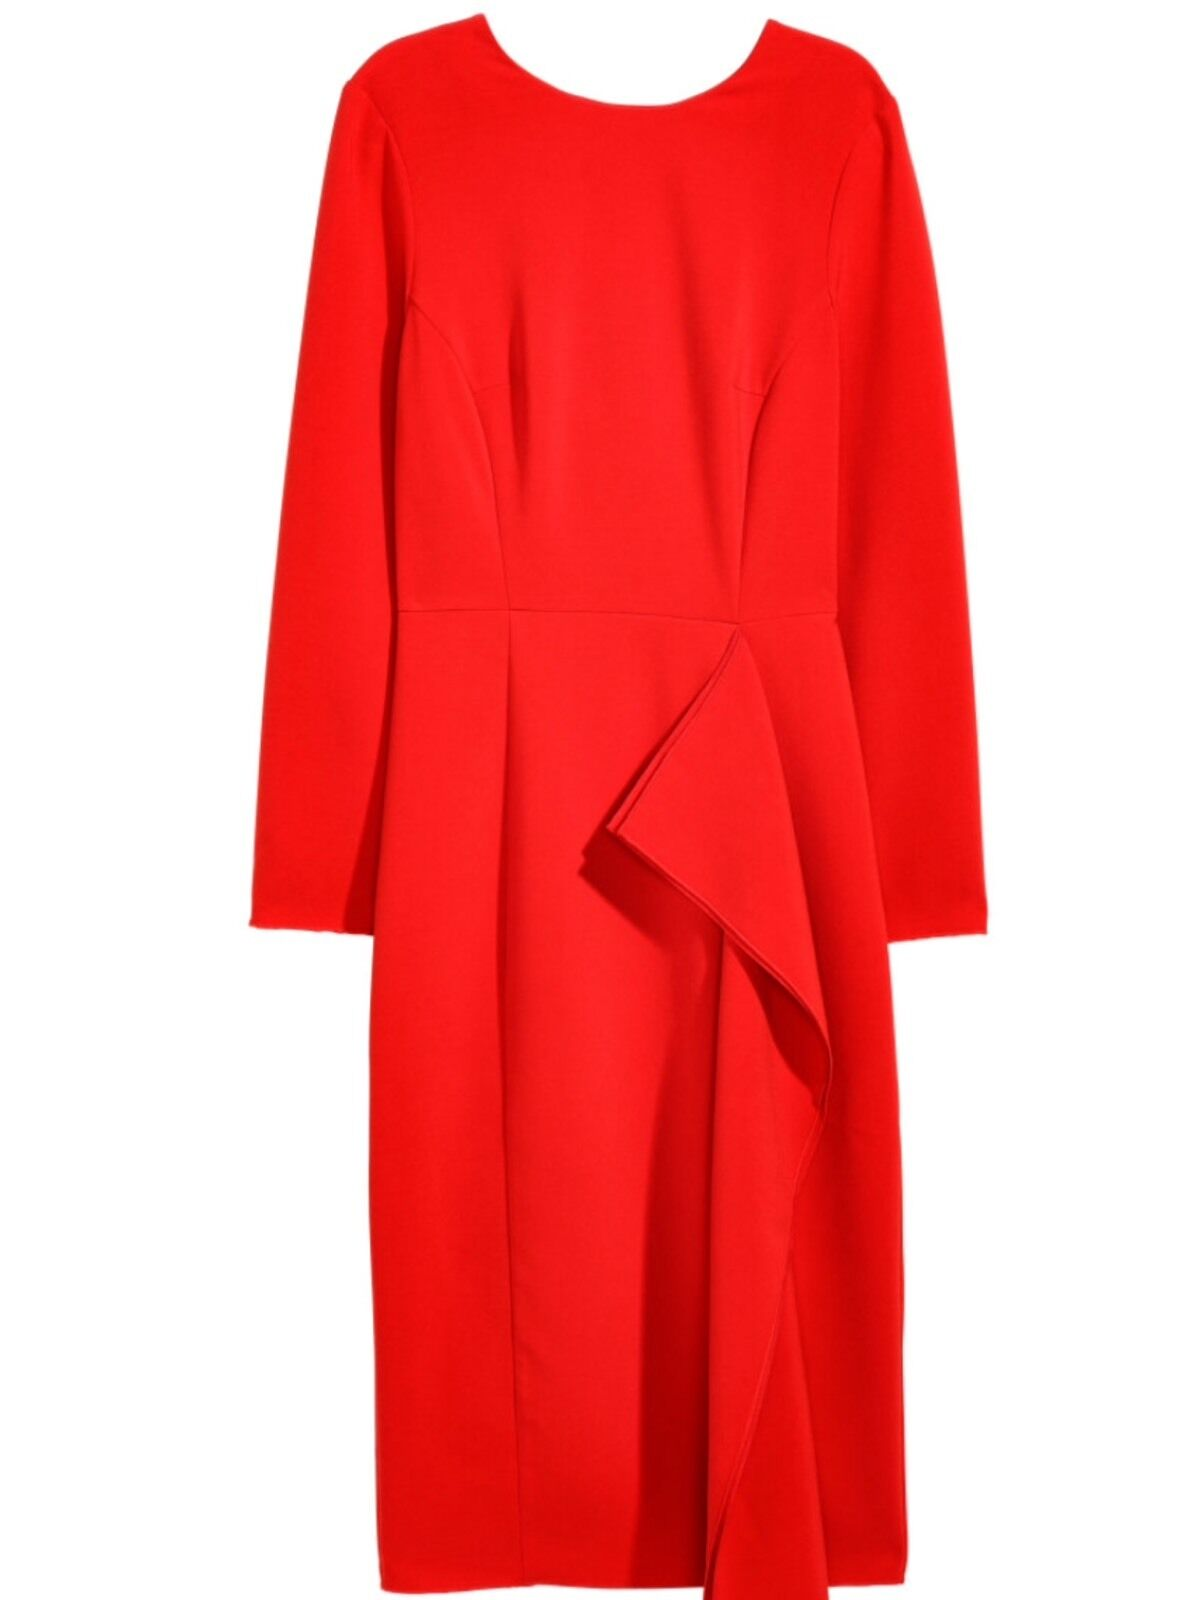 EtuiKleid Sehr apart Damenmode Accessoires Abendkleid Blogger    Größe 42 Diva